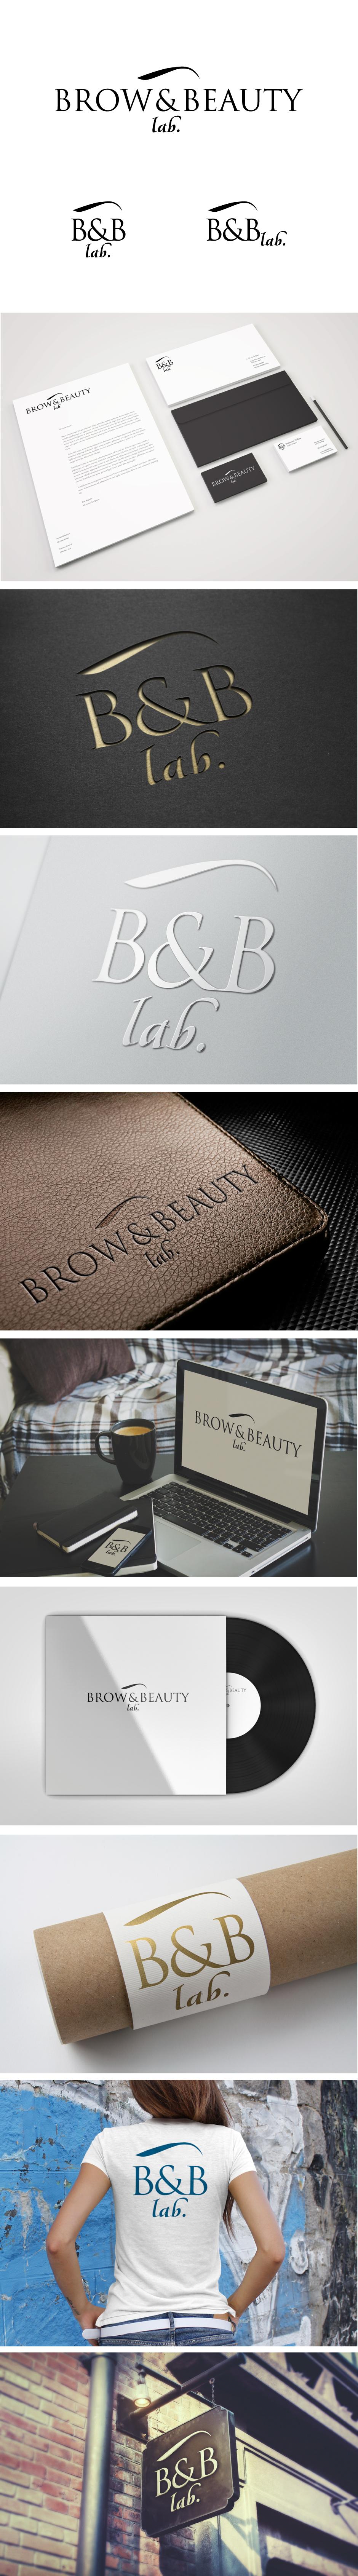 Разработка логотипа салона красоты